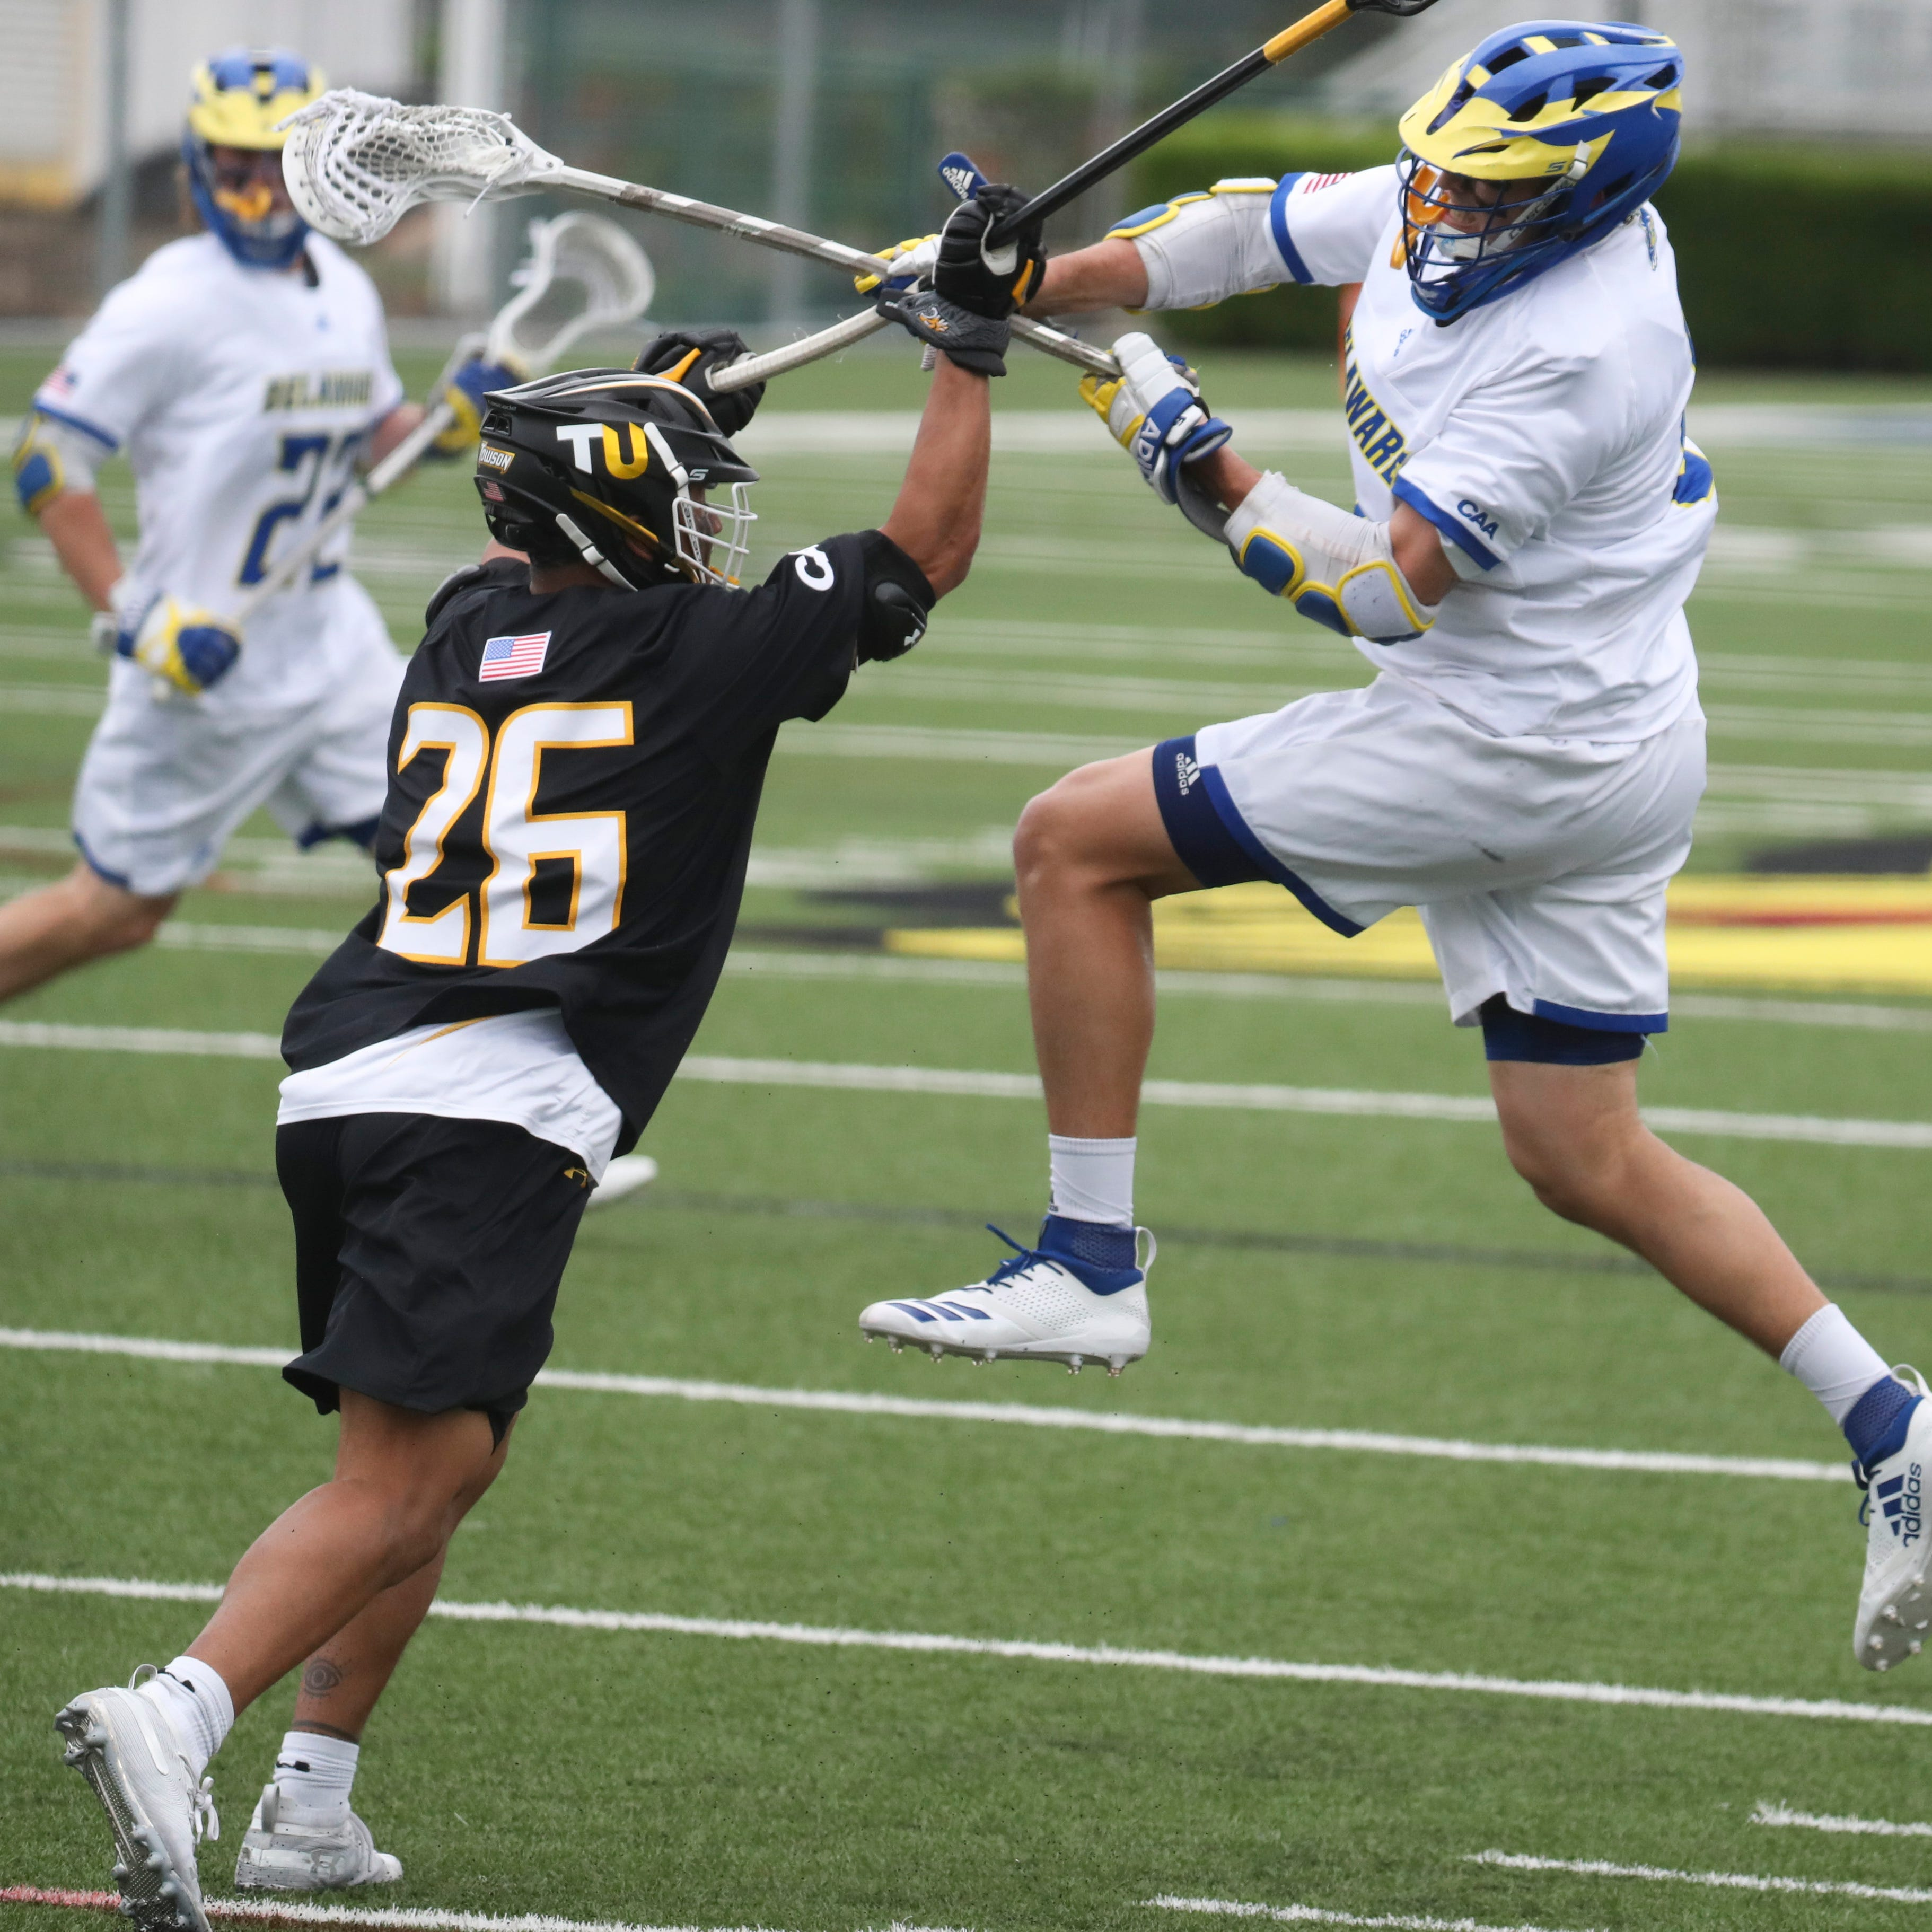 University of Delaware lacrosse season ends in CAA Tournament defeat